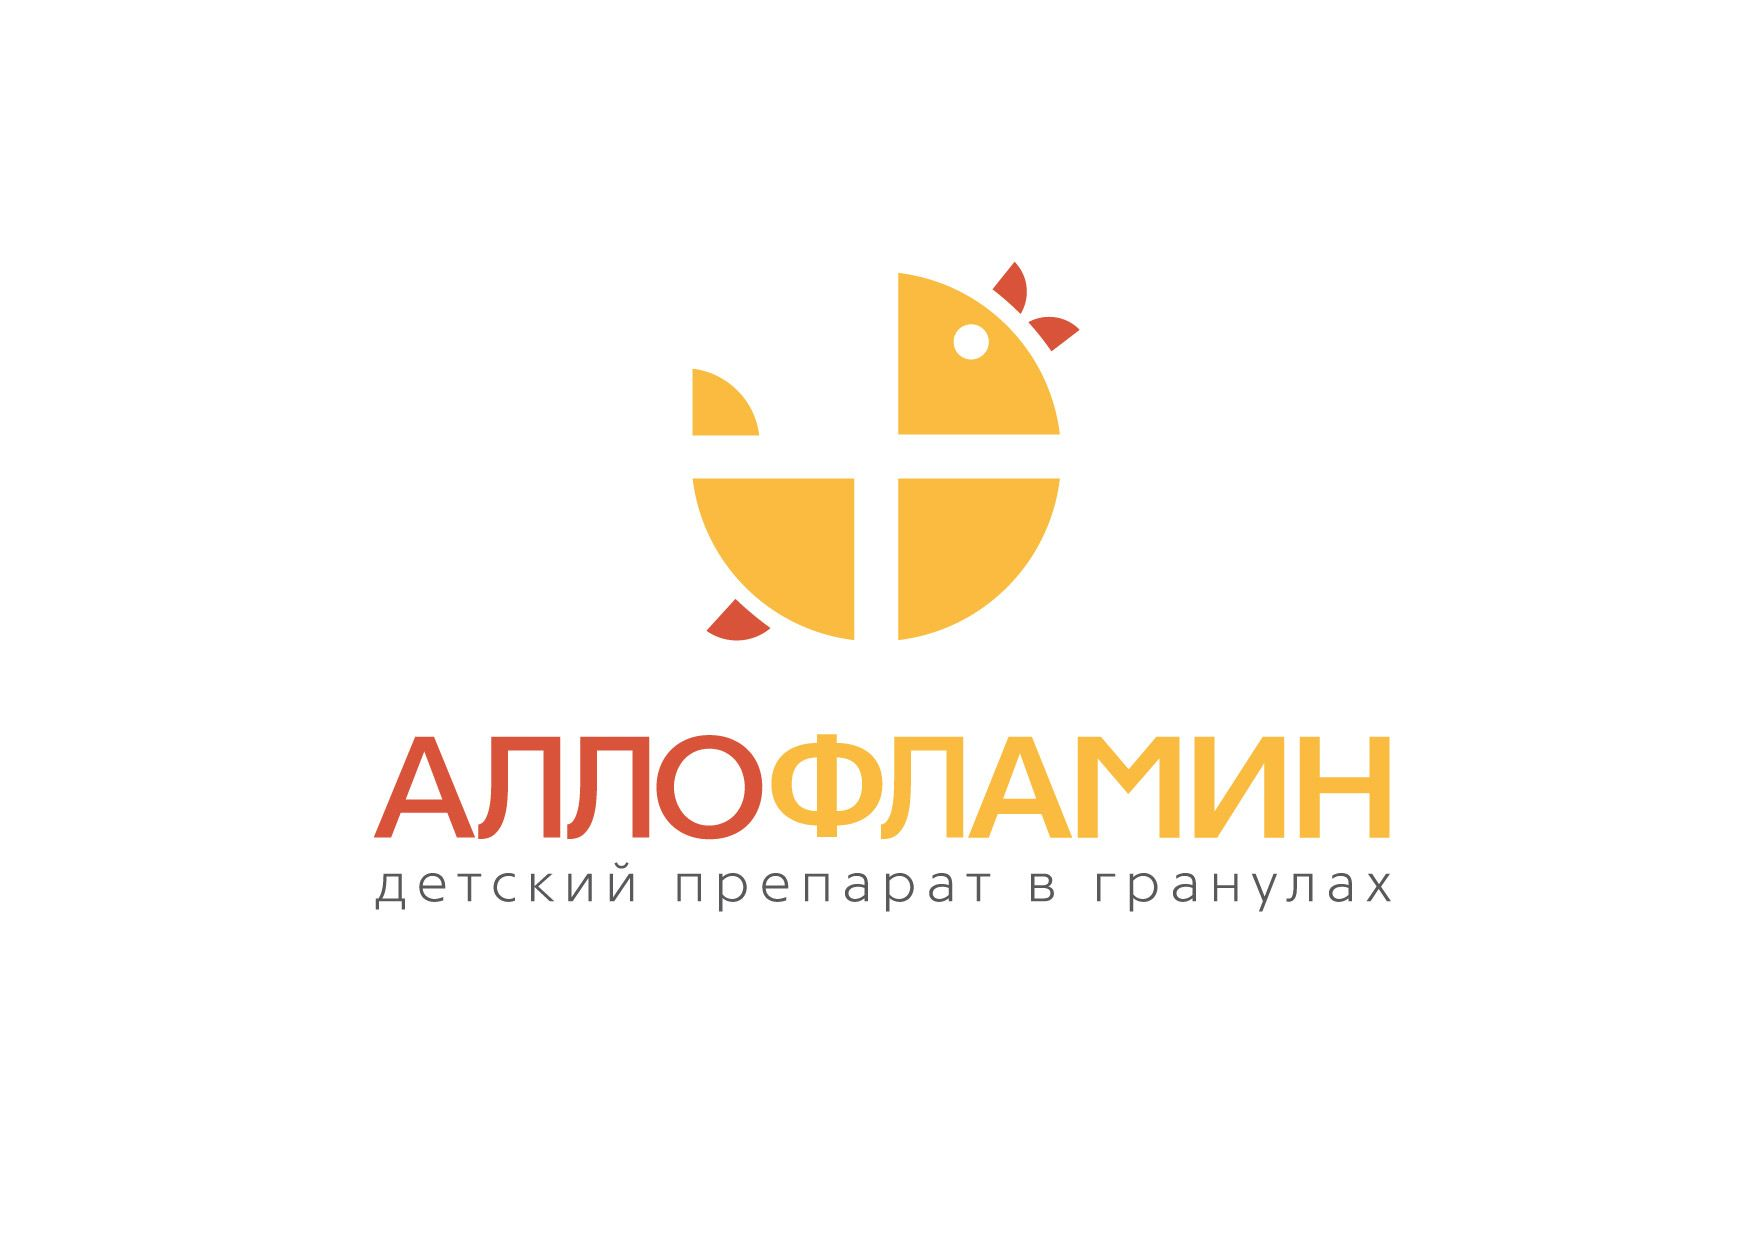 Логотип препарата Аллофламин - дизайнер igor_kireyev